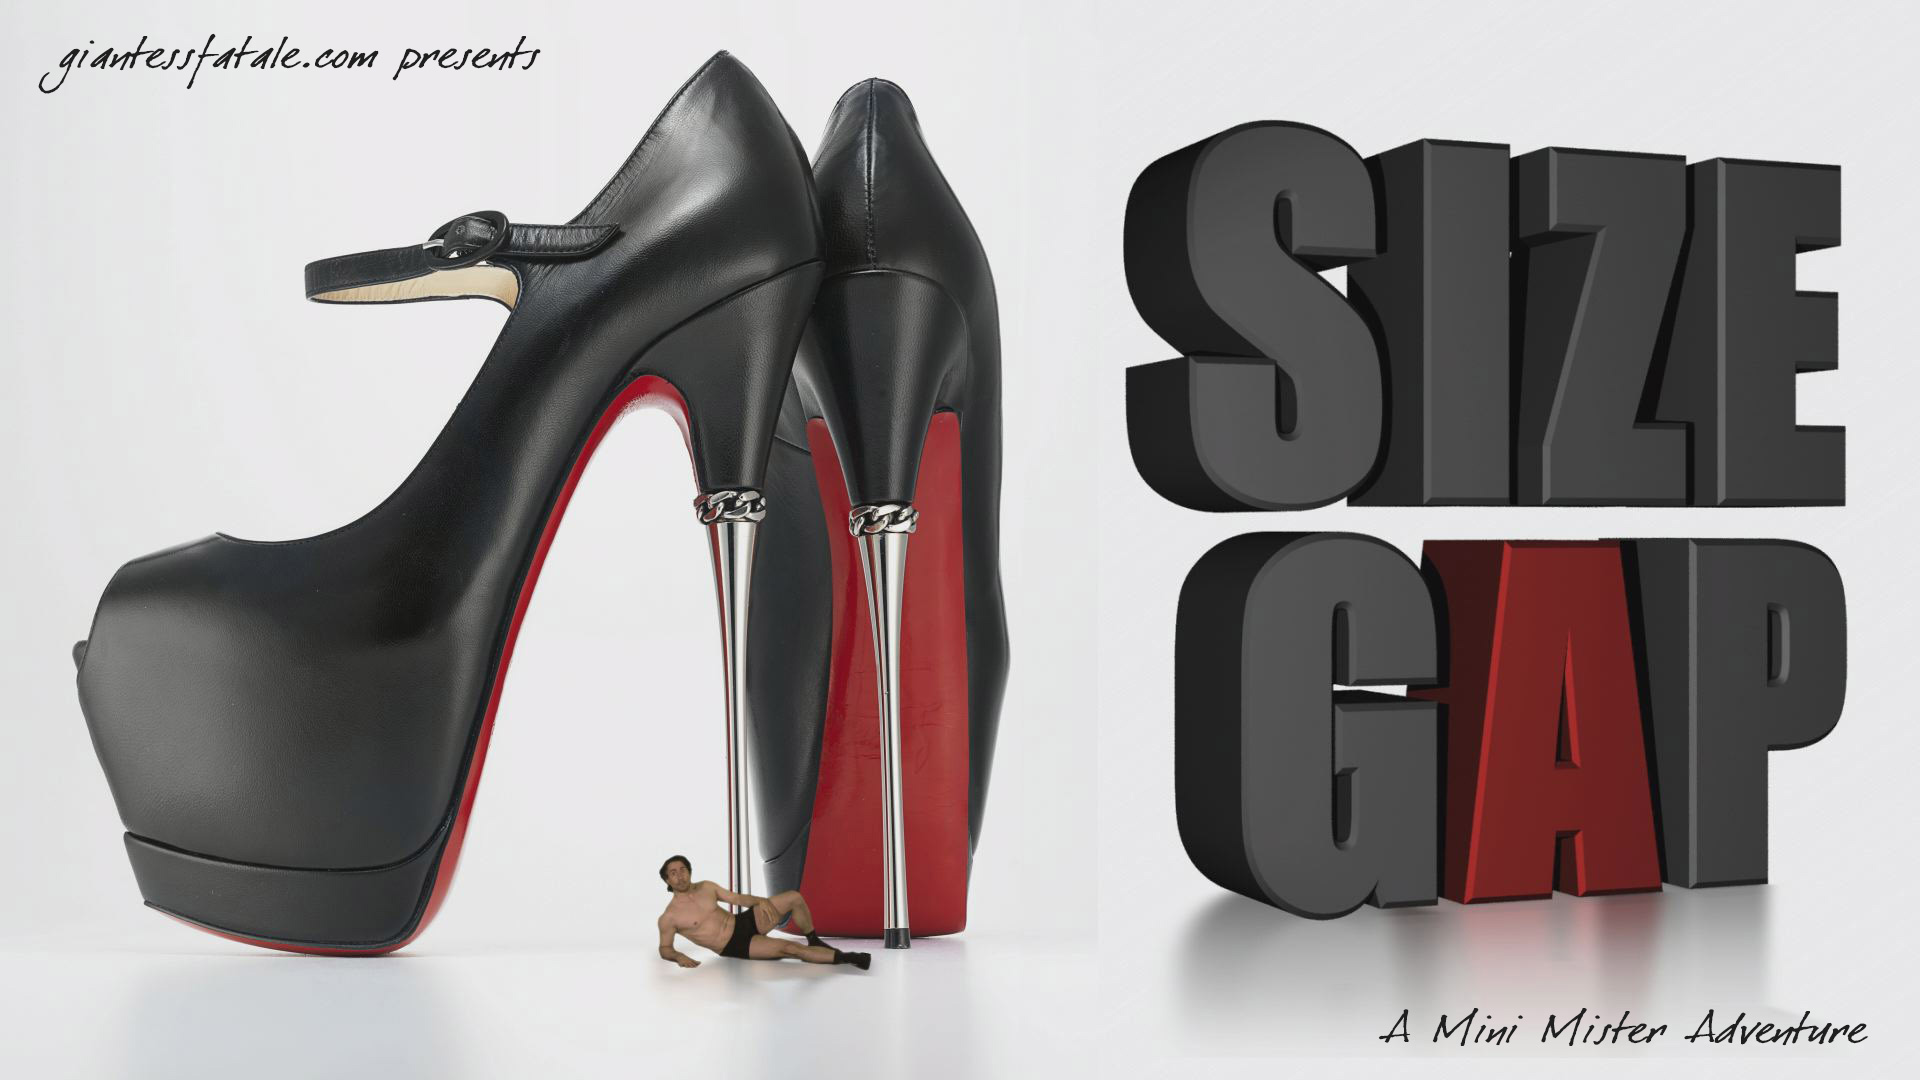 Size Gap Poster